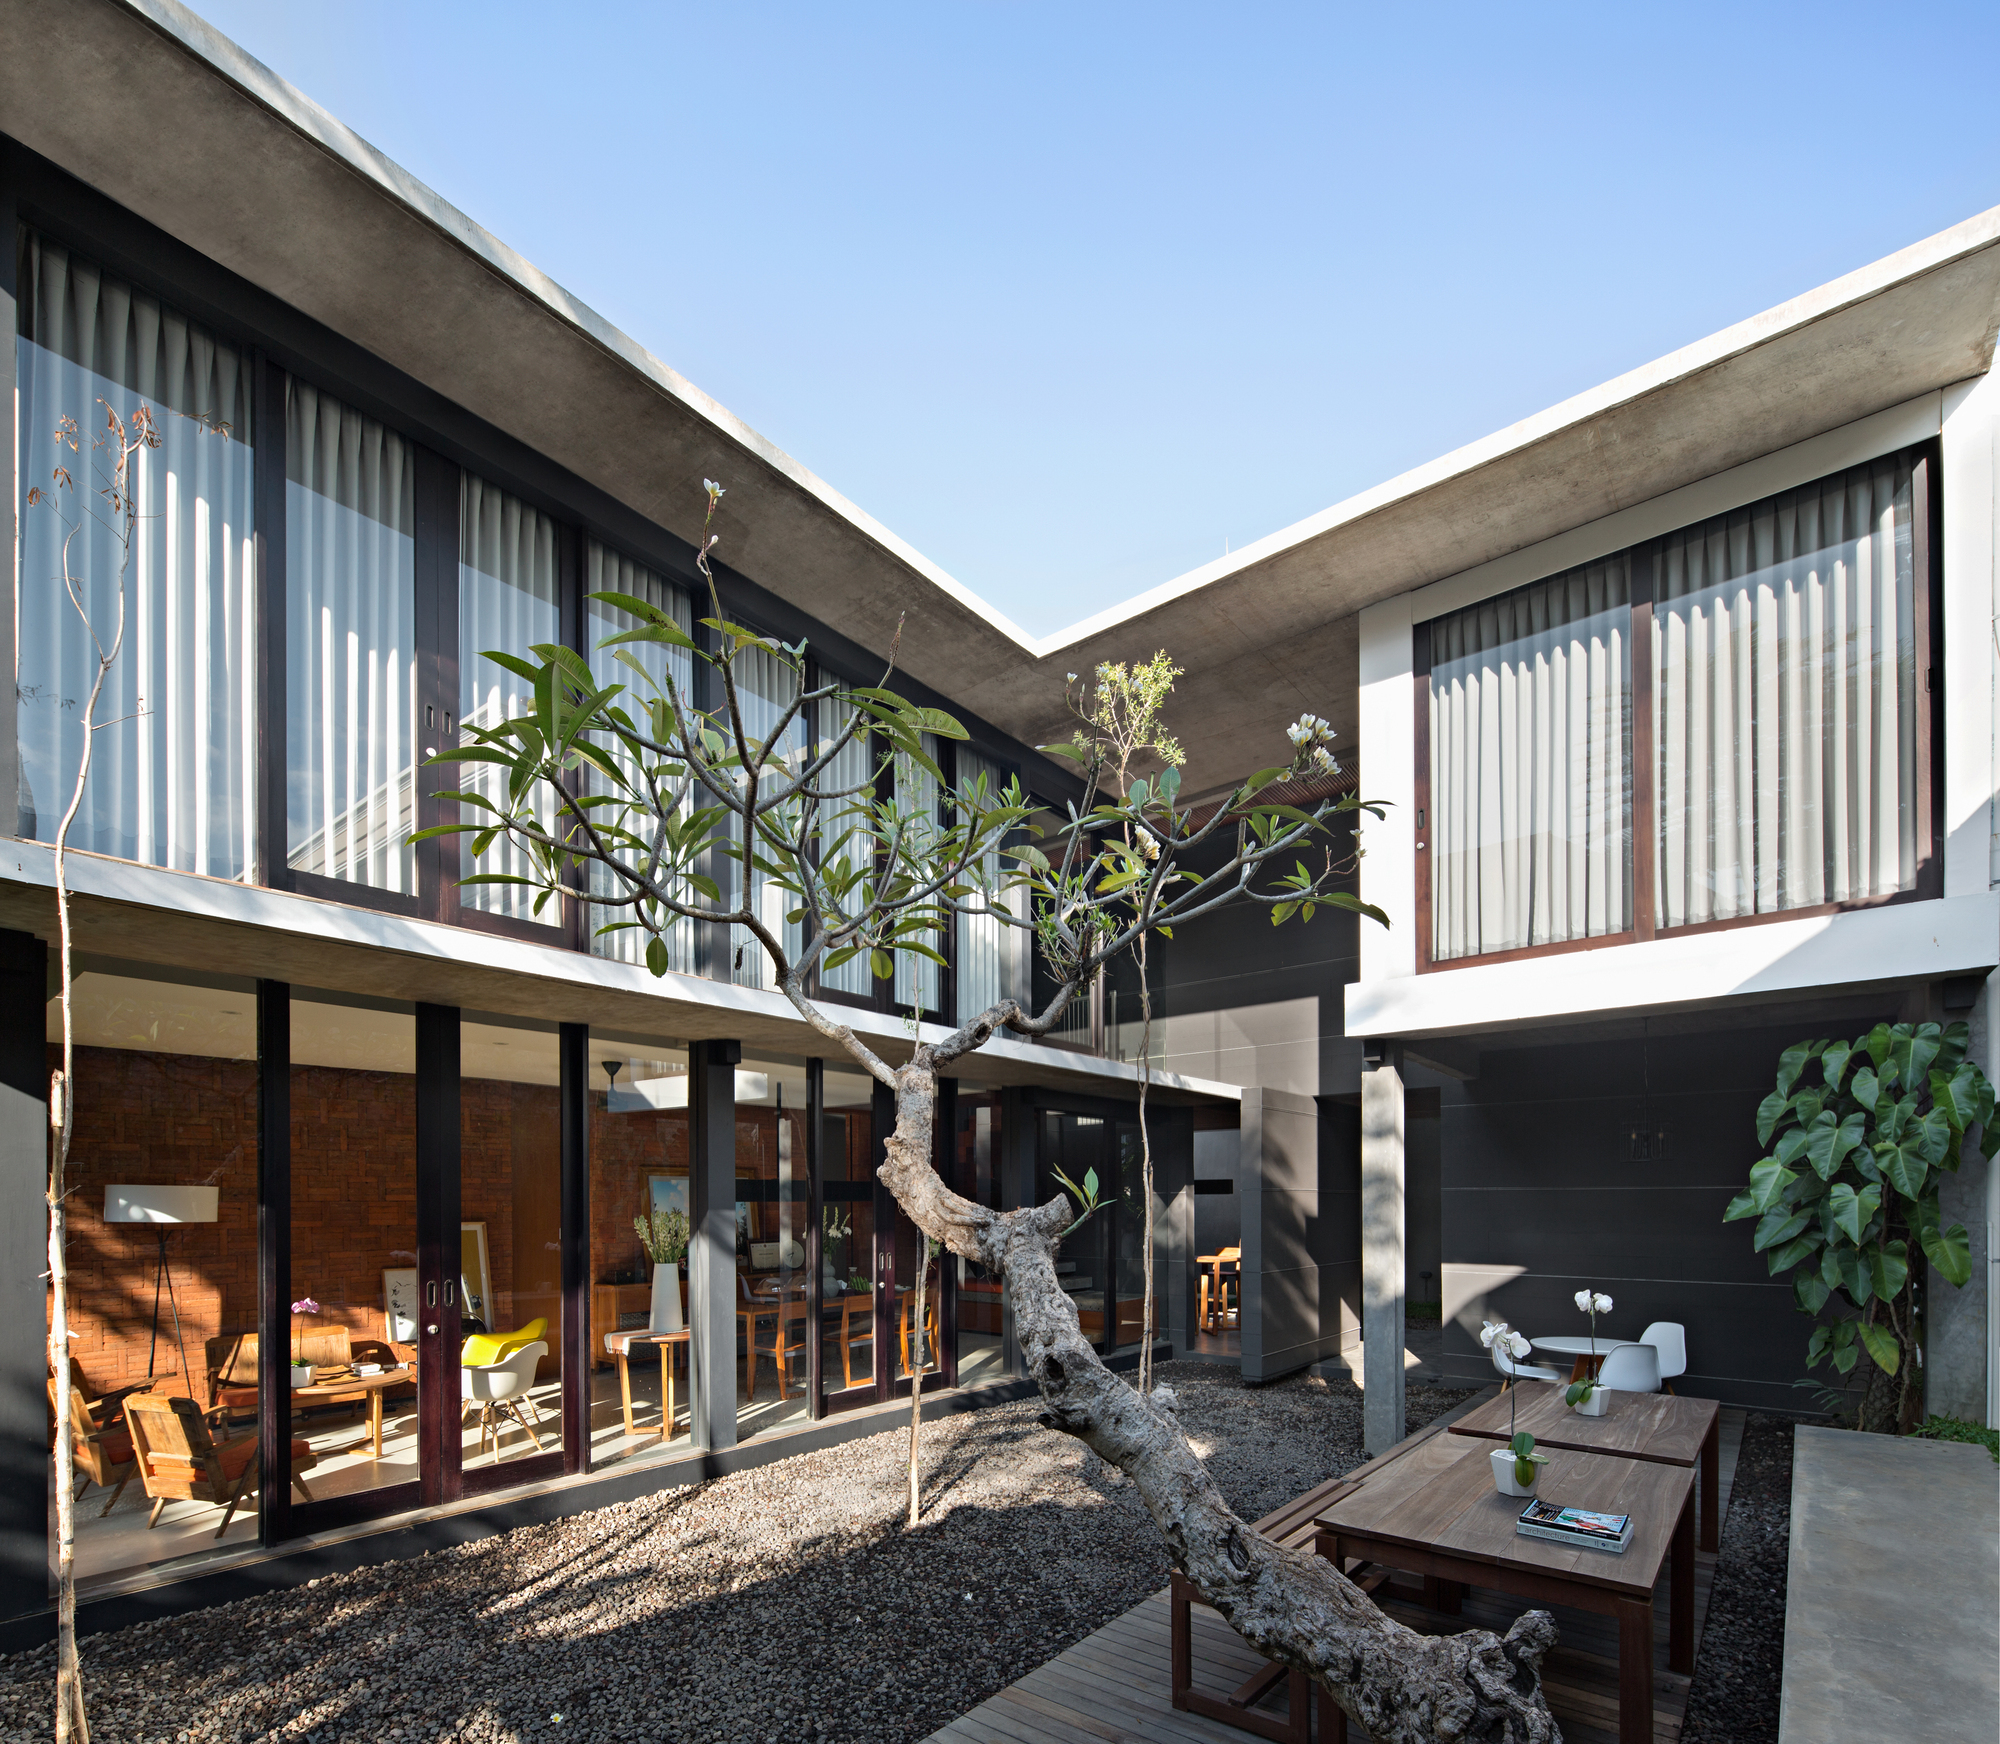 Bali Home Design Ideas: Sujiva Living / Somia Design Studio